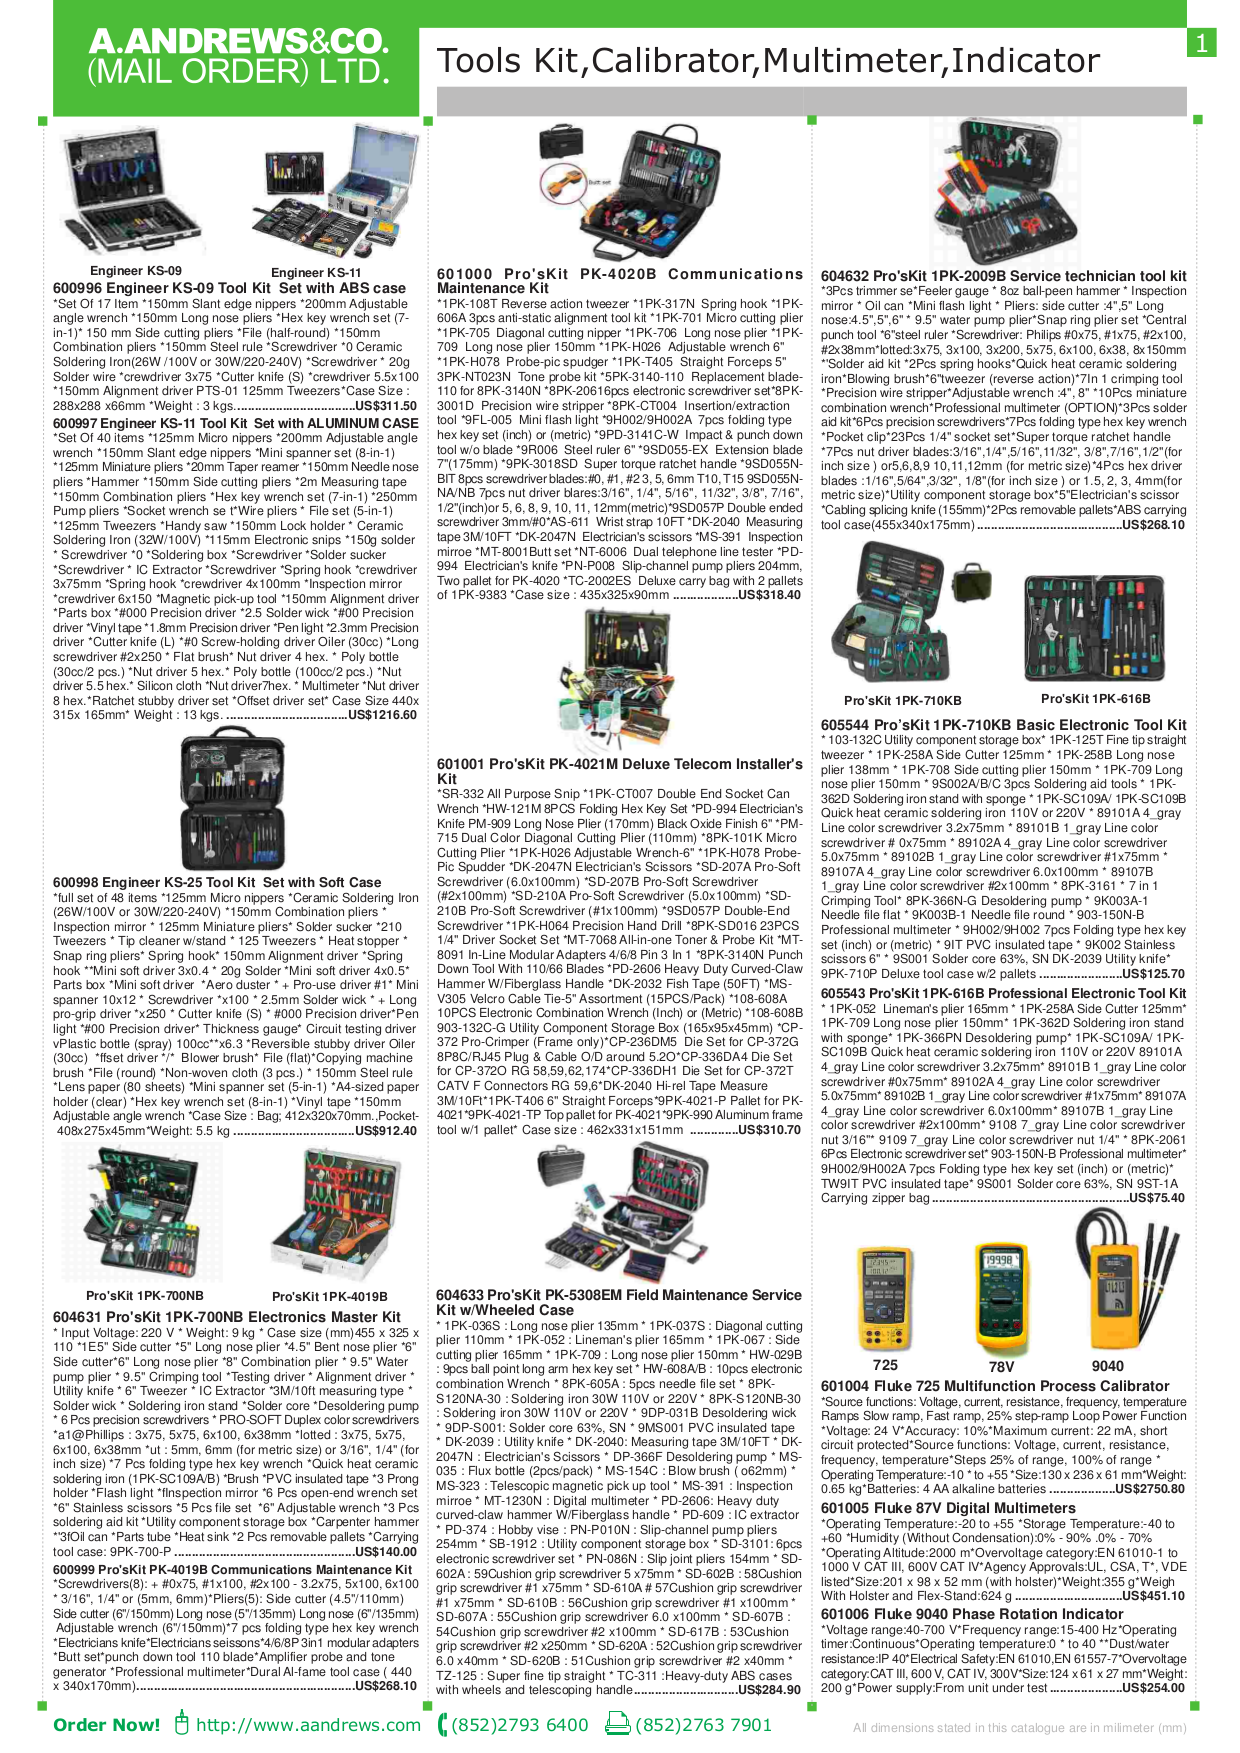 pdf for Victorinox Storage SwissFlash SwissFlash 16GB manual